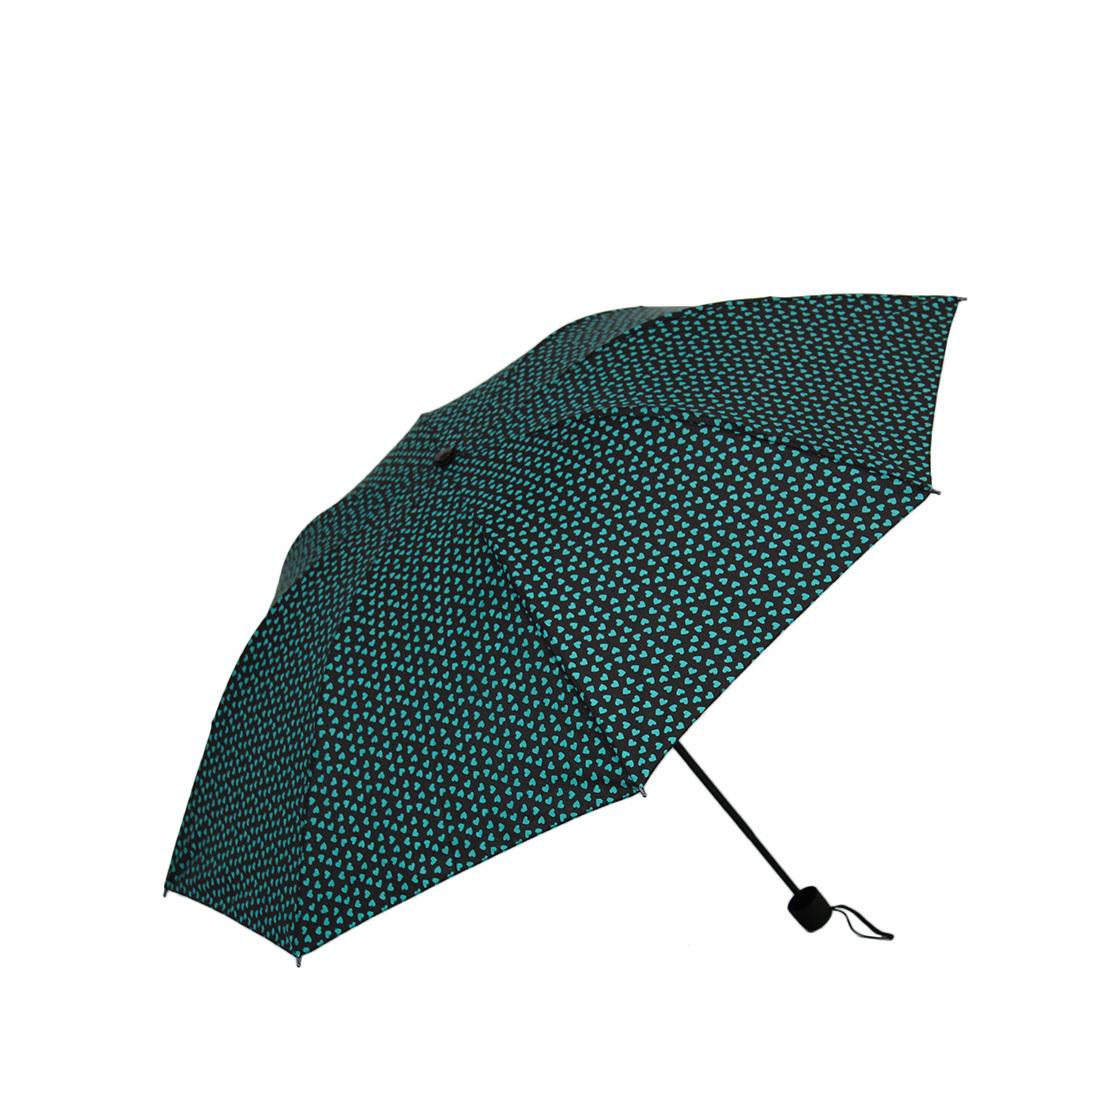 Heart design umbrella